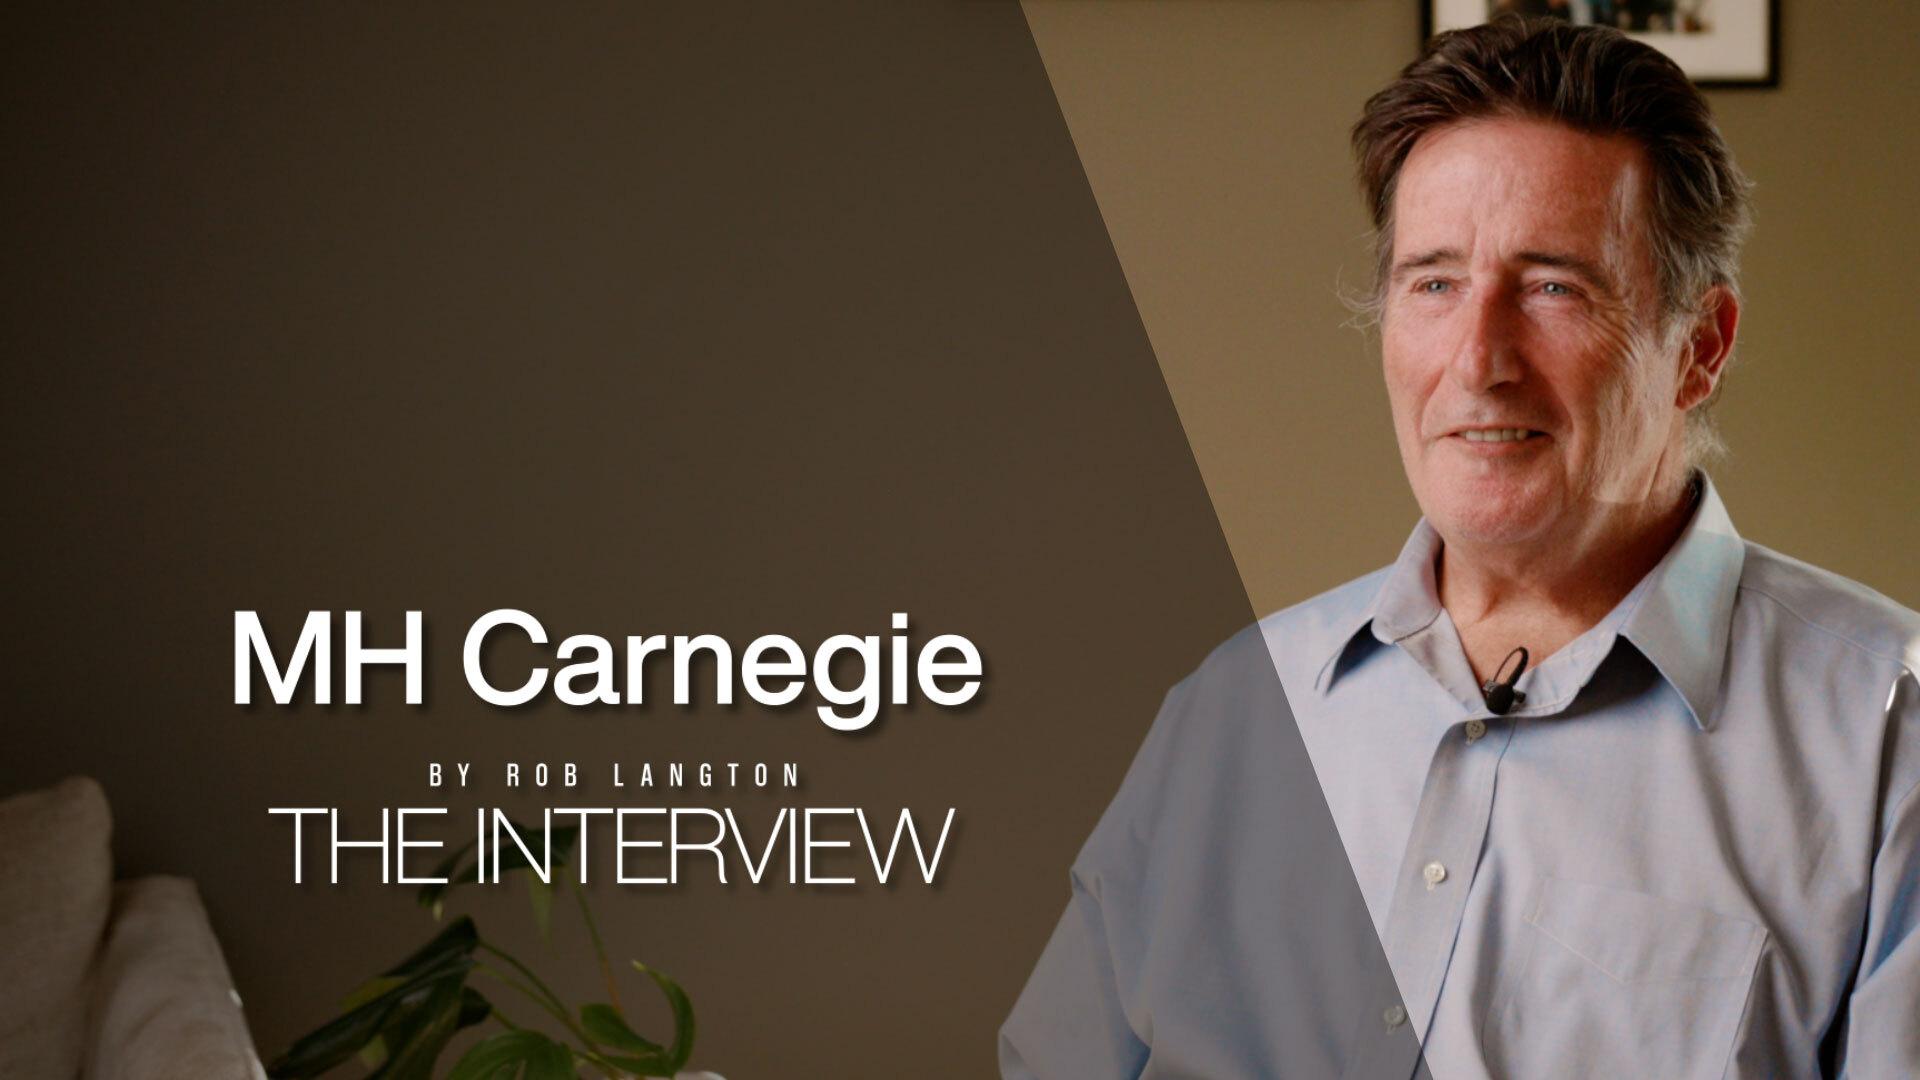 Mark Carnegie - MH Carnegie & Co